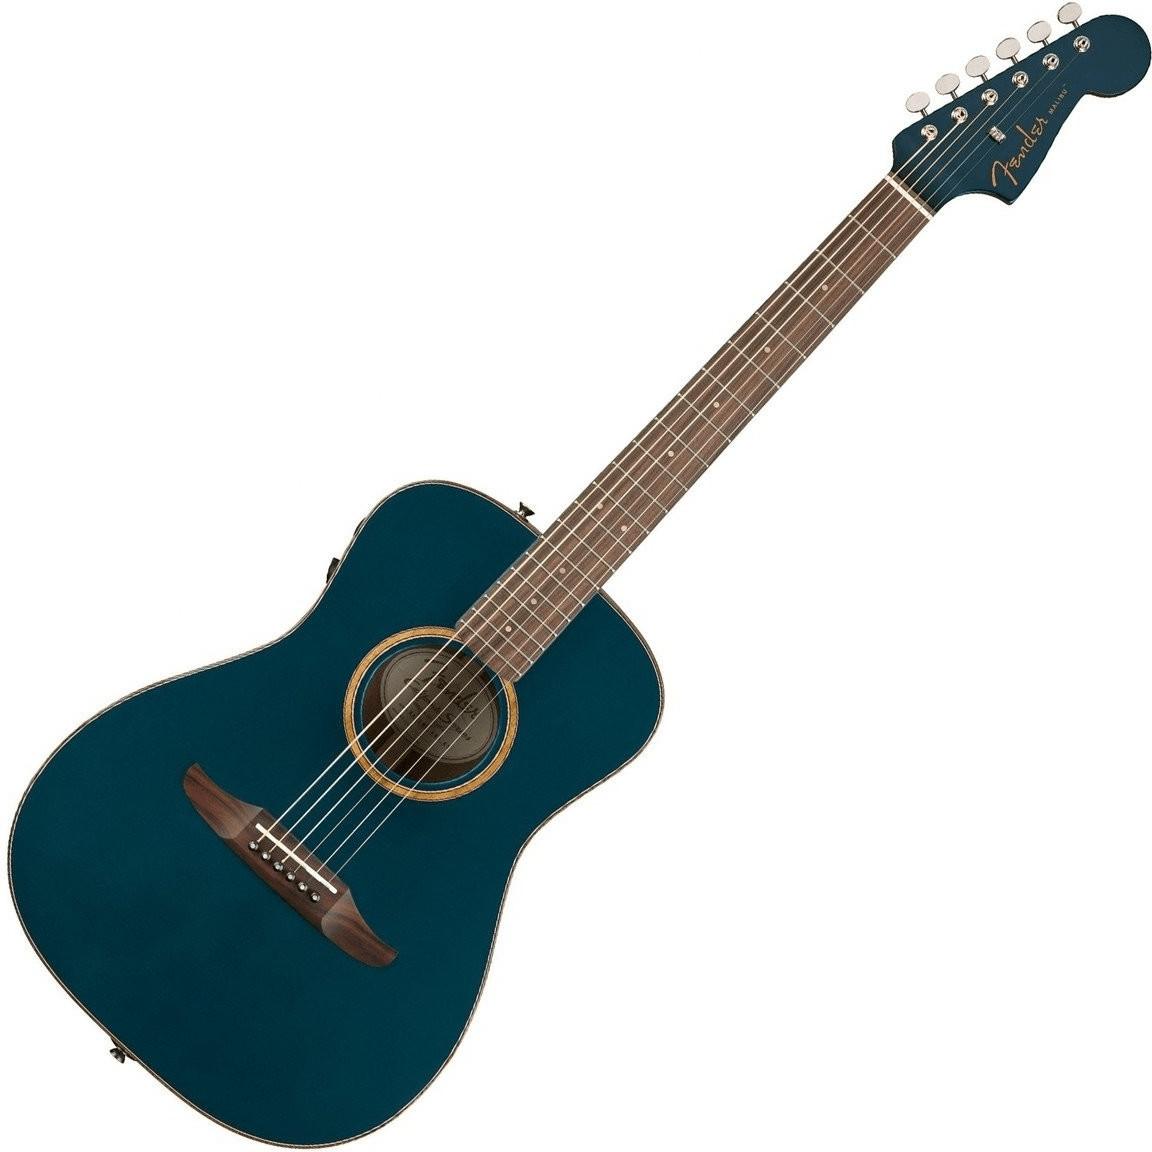 Fender Malibu Classic 2018 Cosmic Turquoise